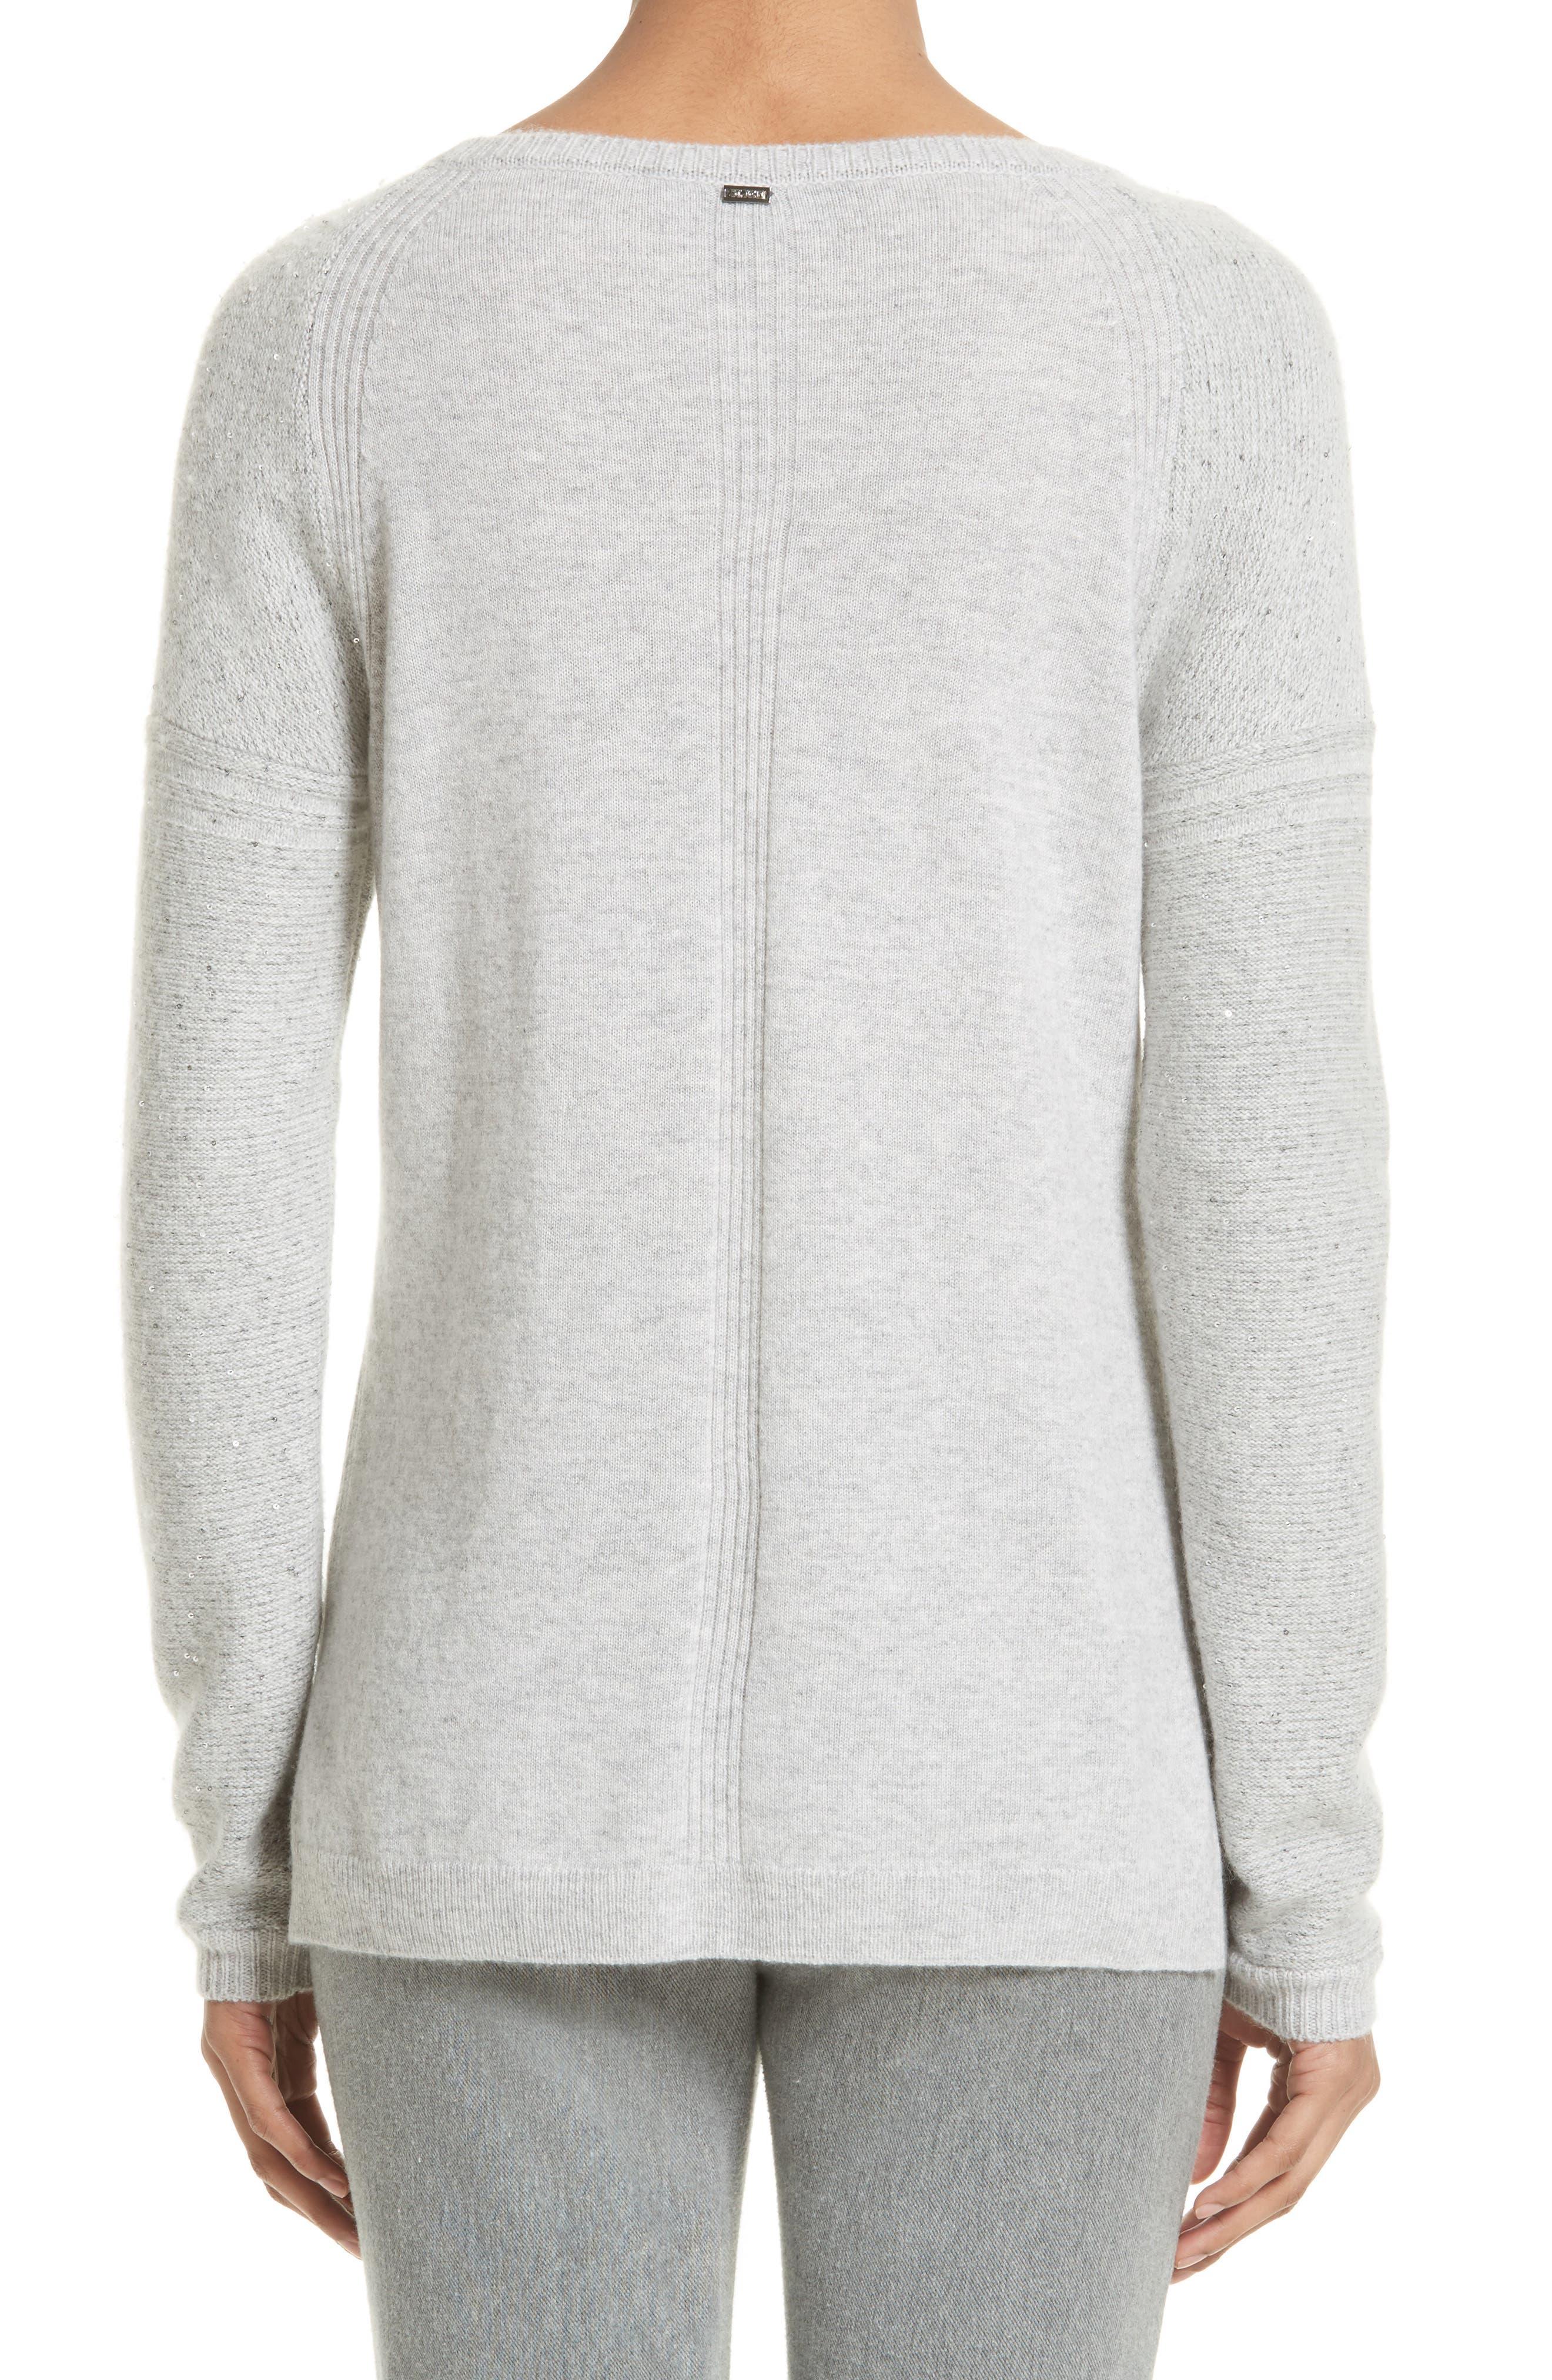 Micro Sequin Stripe Reverse Jersey Cashmere Blend Sweater,                             Alternate thumbnail 2, color,                             060